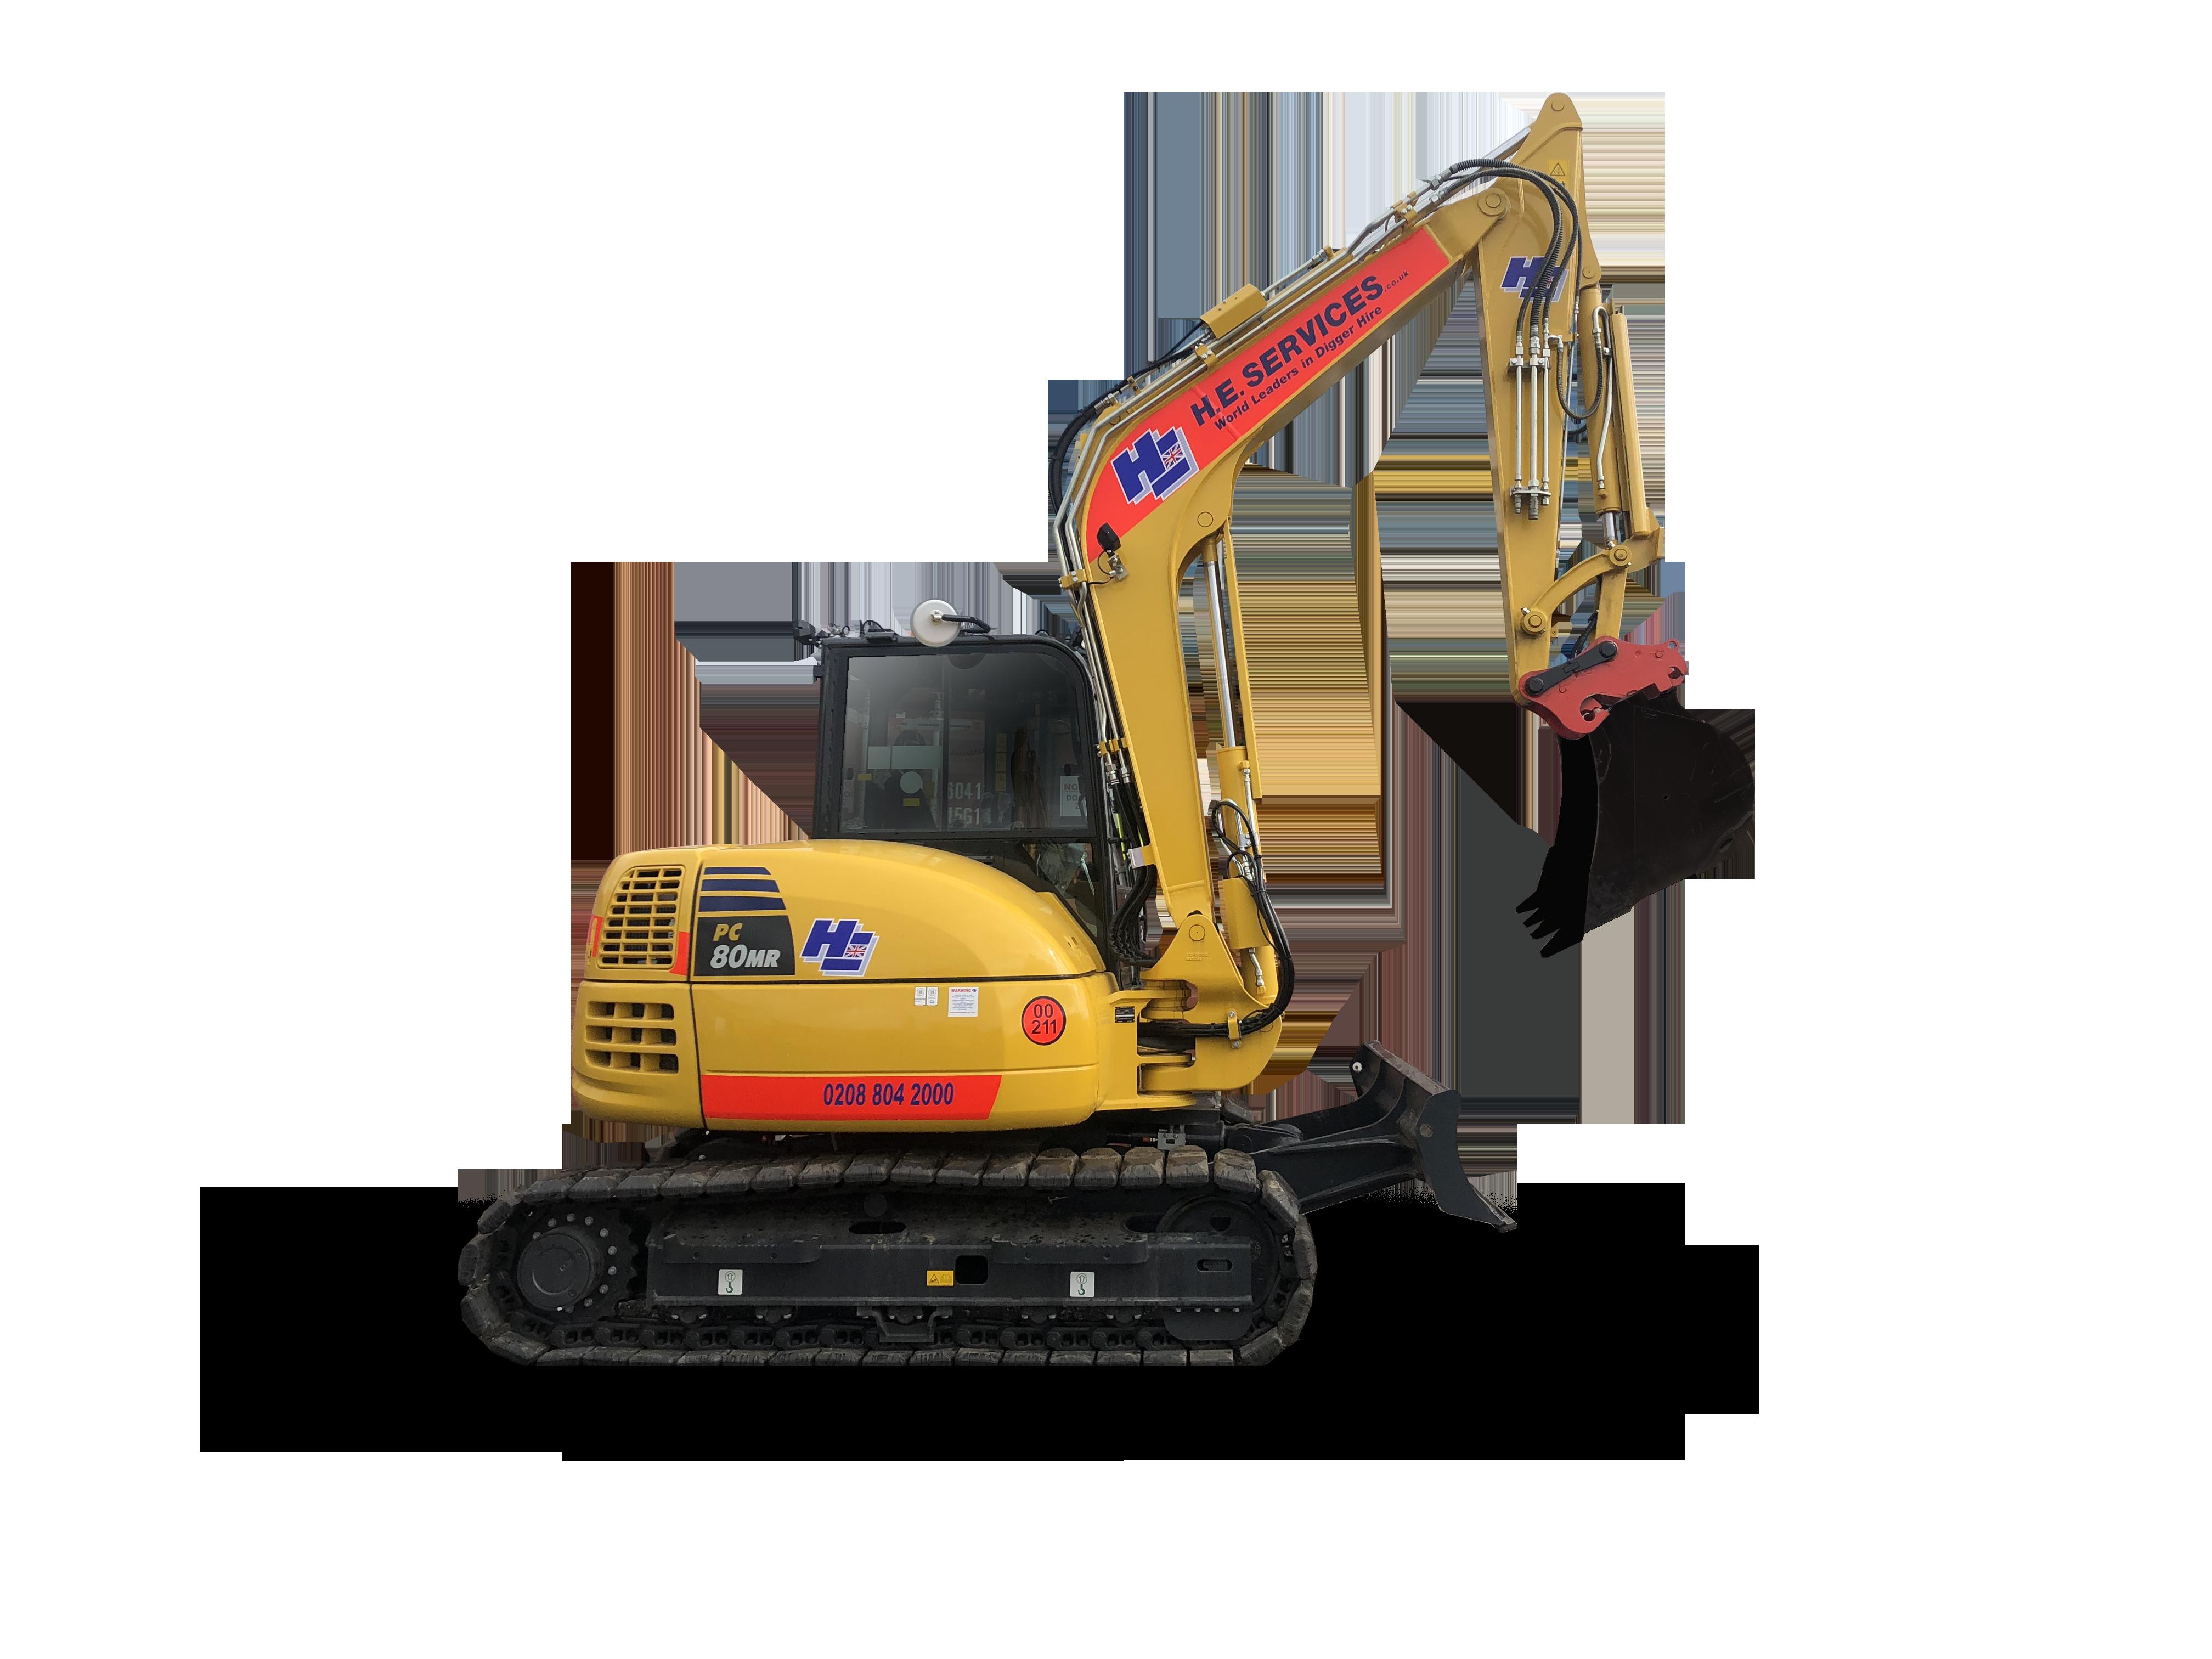 8 Ton Excavator Midi Digger hire